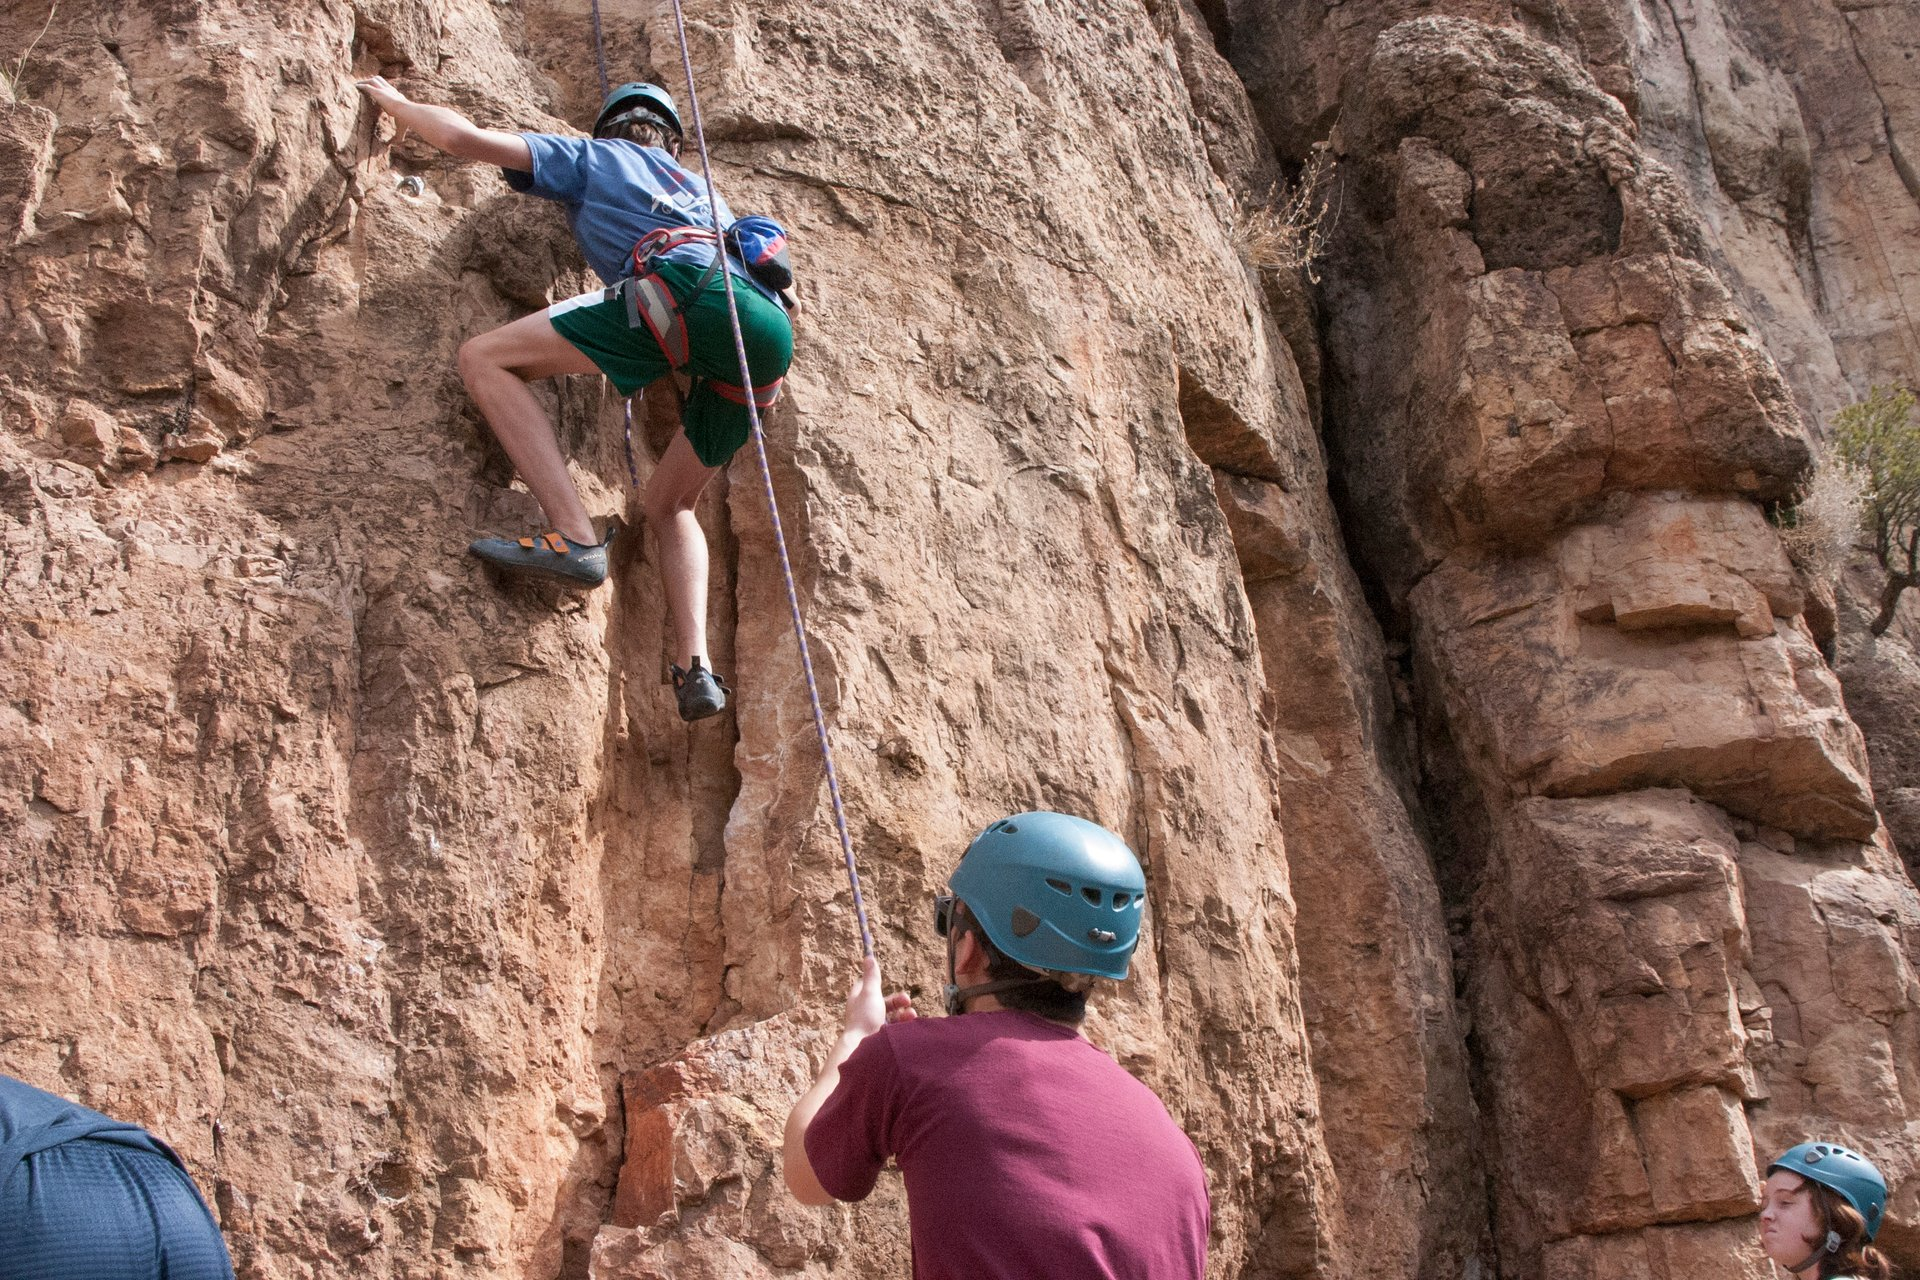 Shelf Road Rock Climbing in Colorado 2020 - Best Time